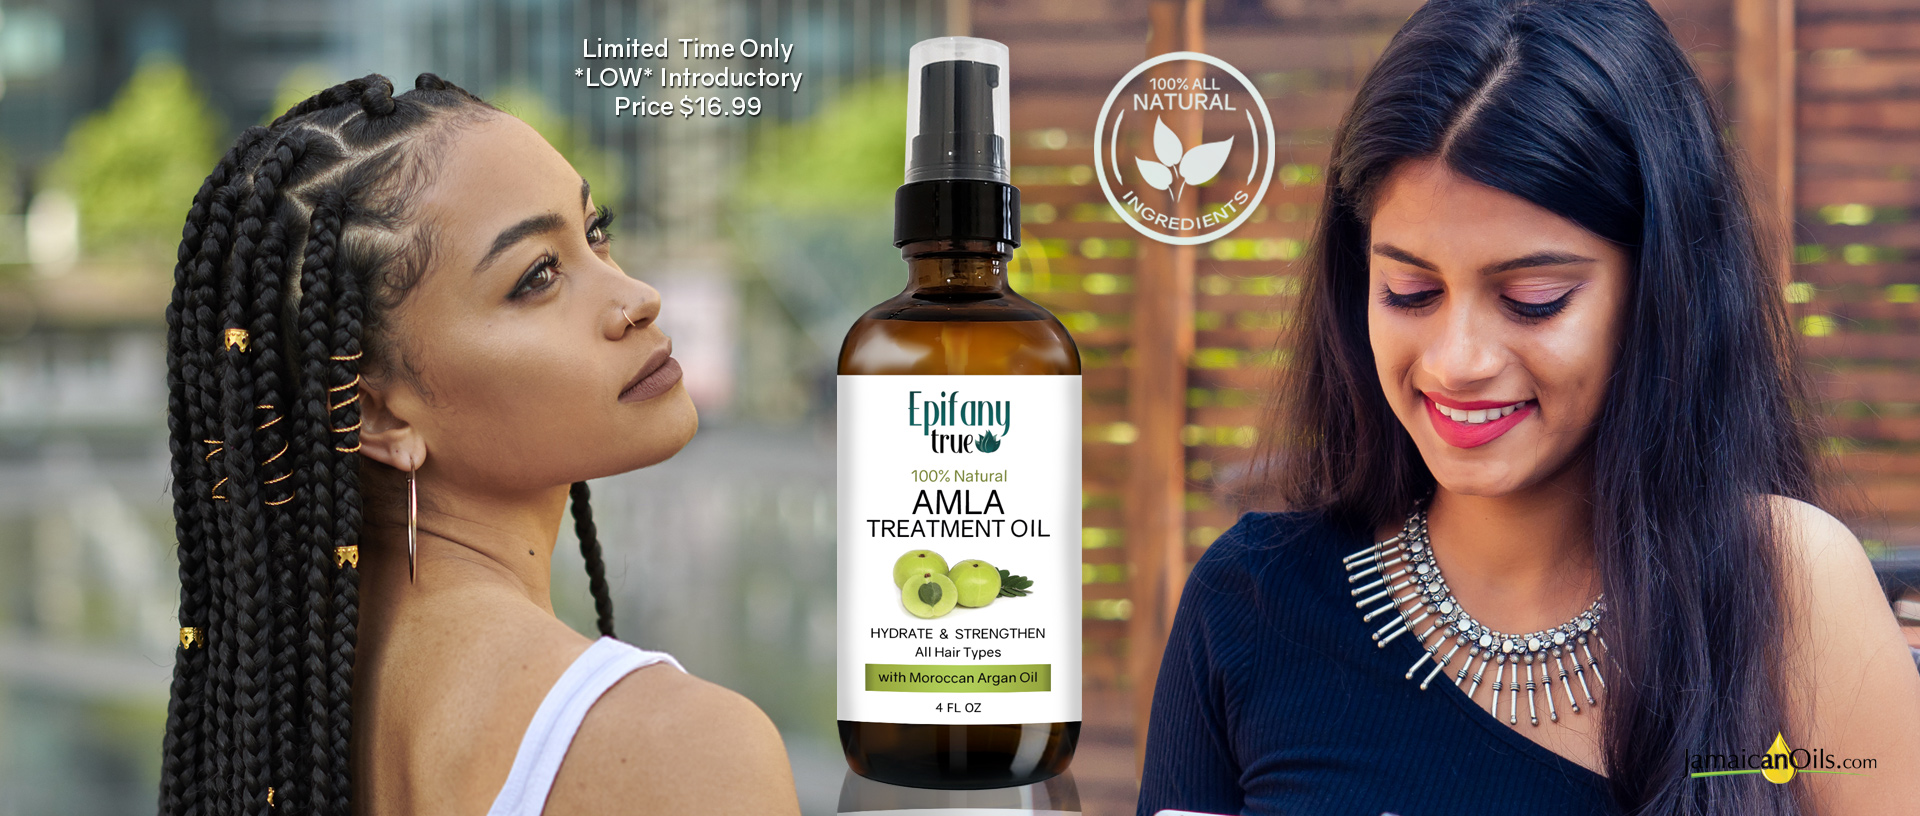 Epifany True 100% Natural Amla Treatment Oil 4oz